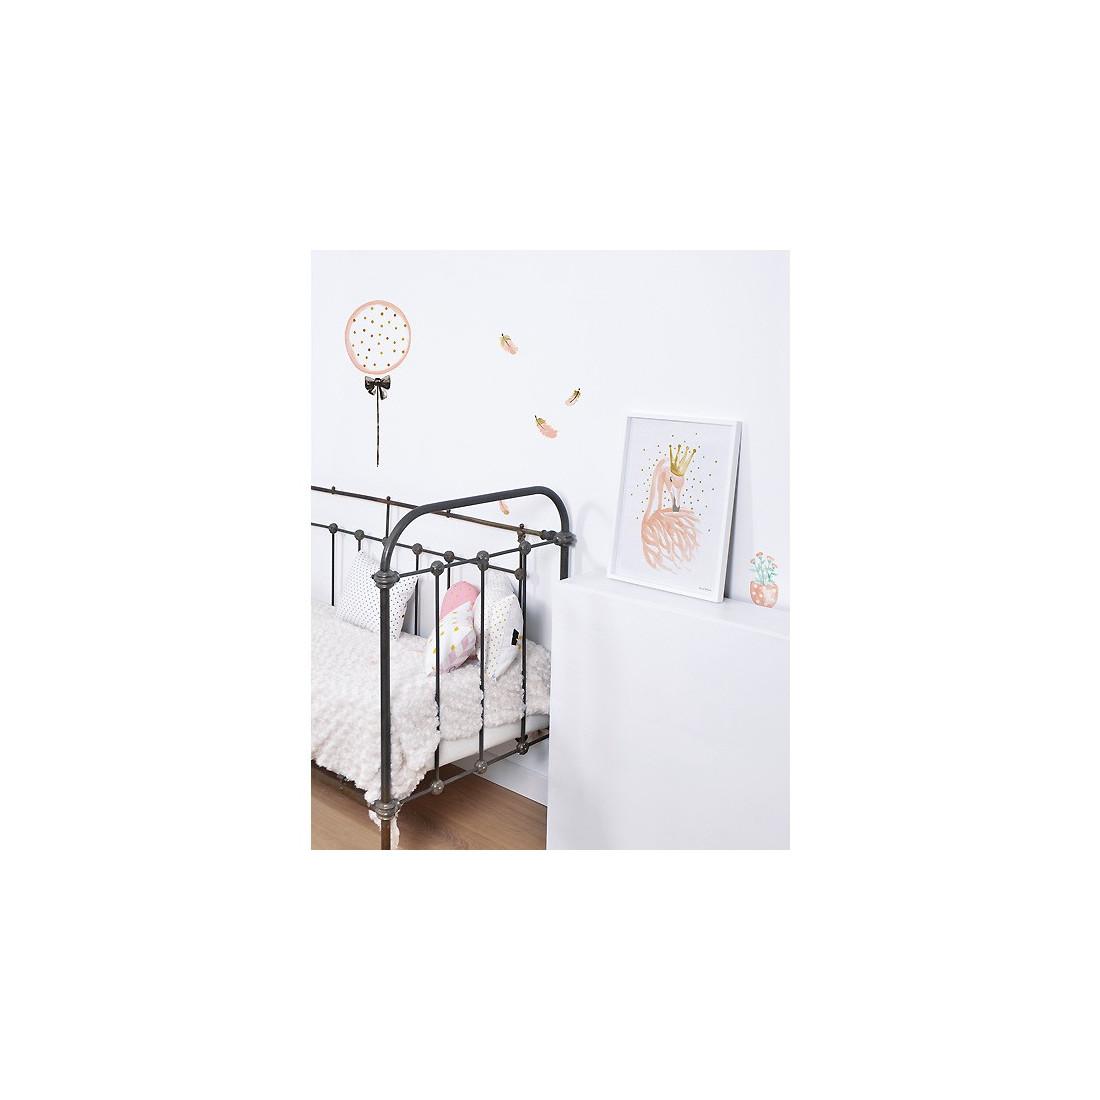 tableau enfant affiche encadr e flamants roses lilipinso ma chambramoi. Black Bedroom Furniture Sets. Home Design Ideas